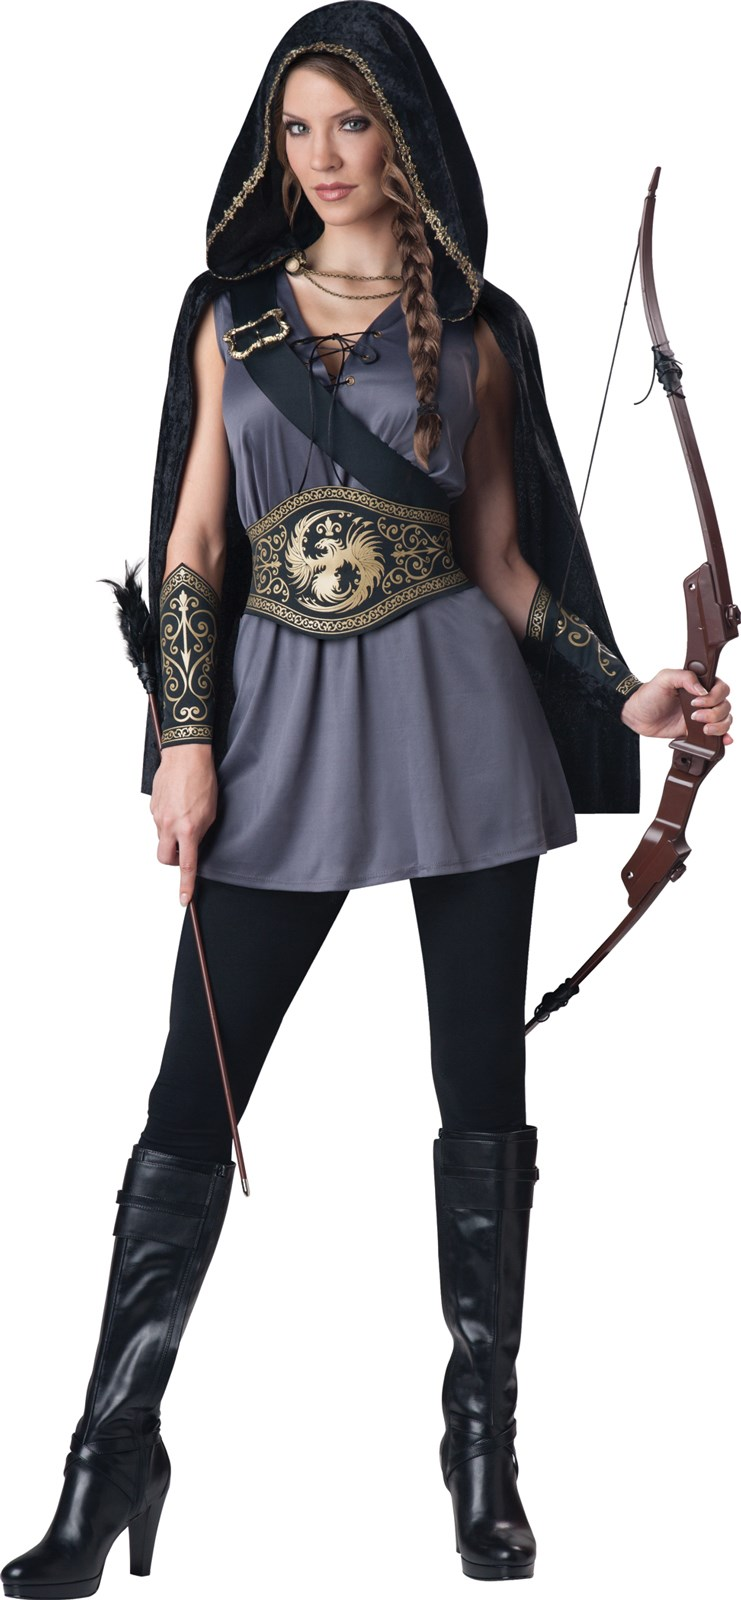 Adult Female Costumes 97